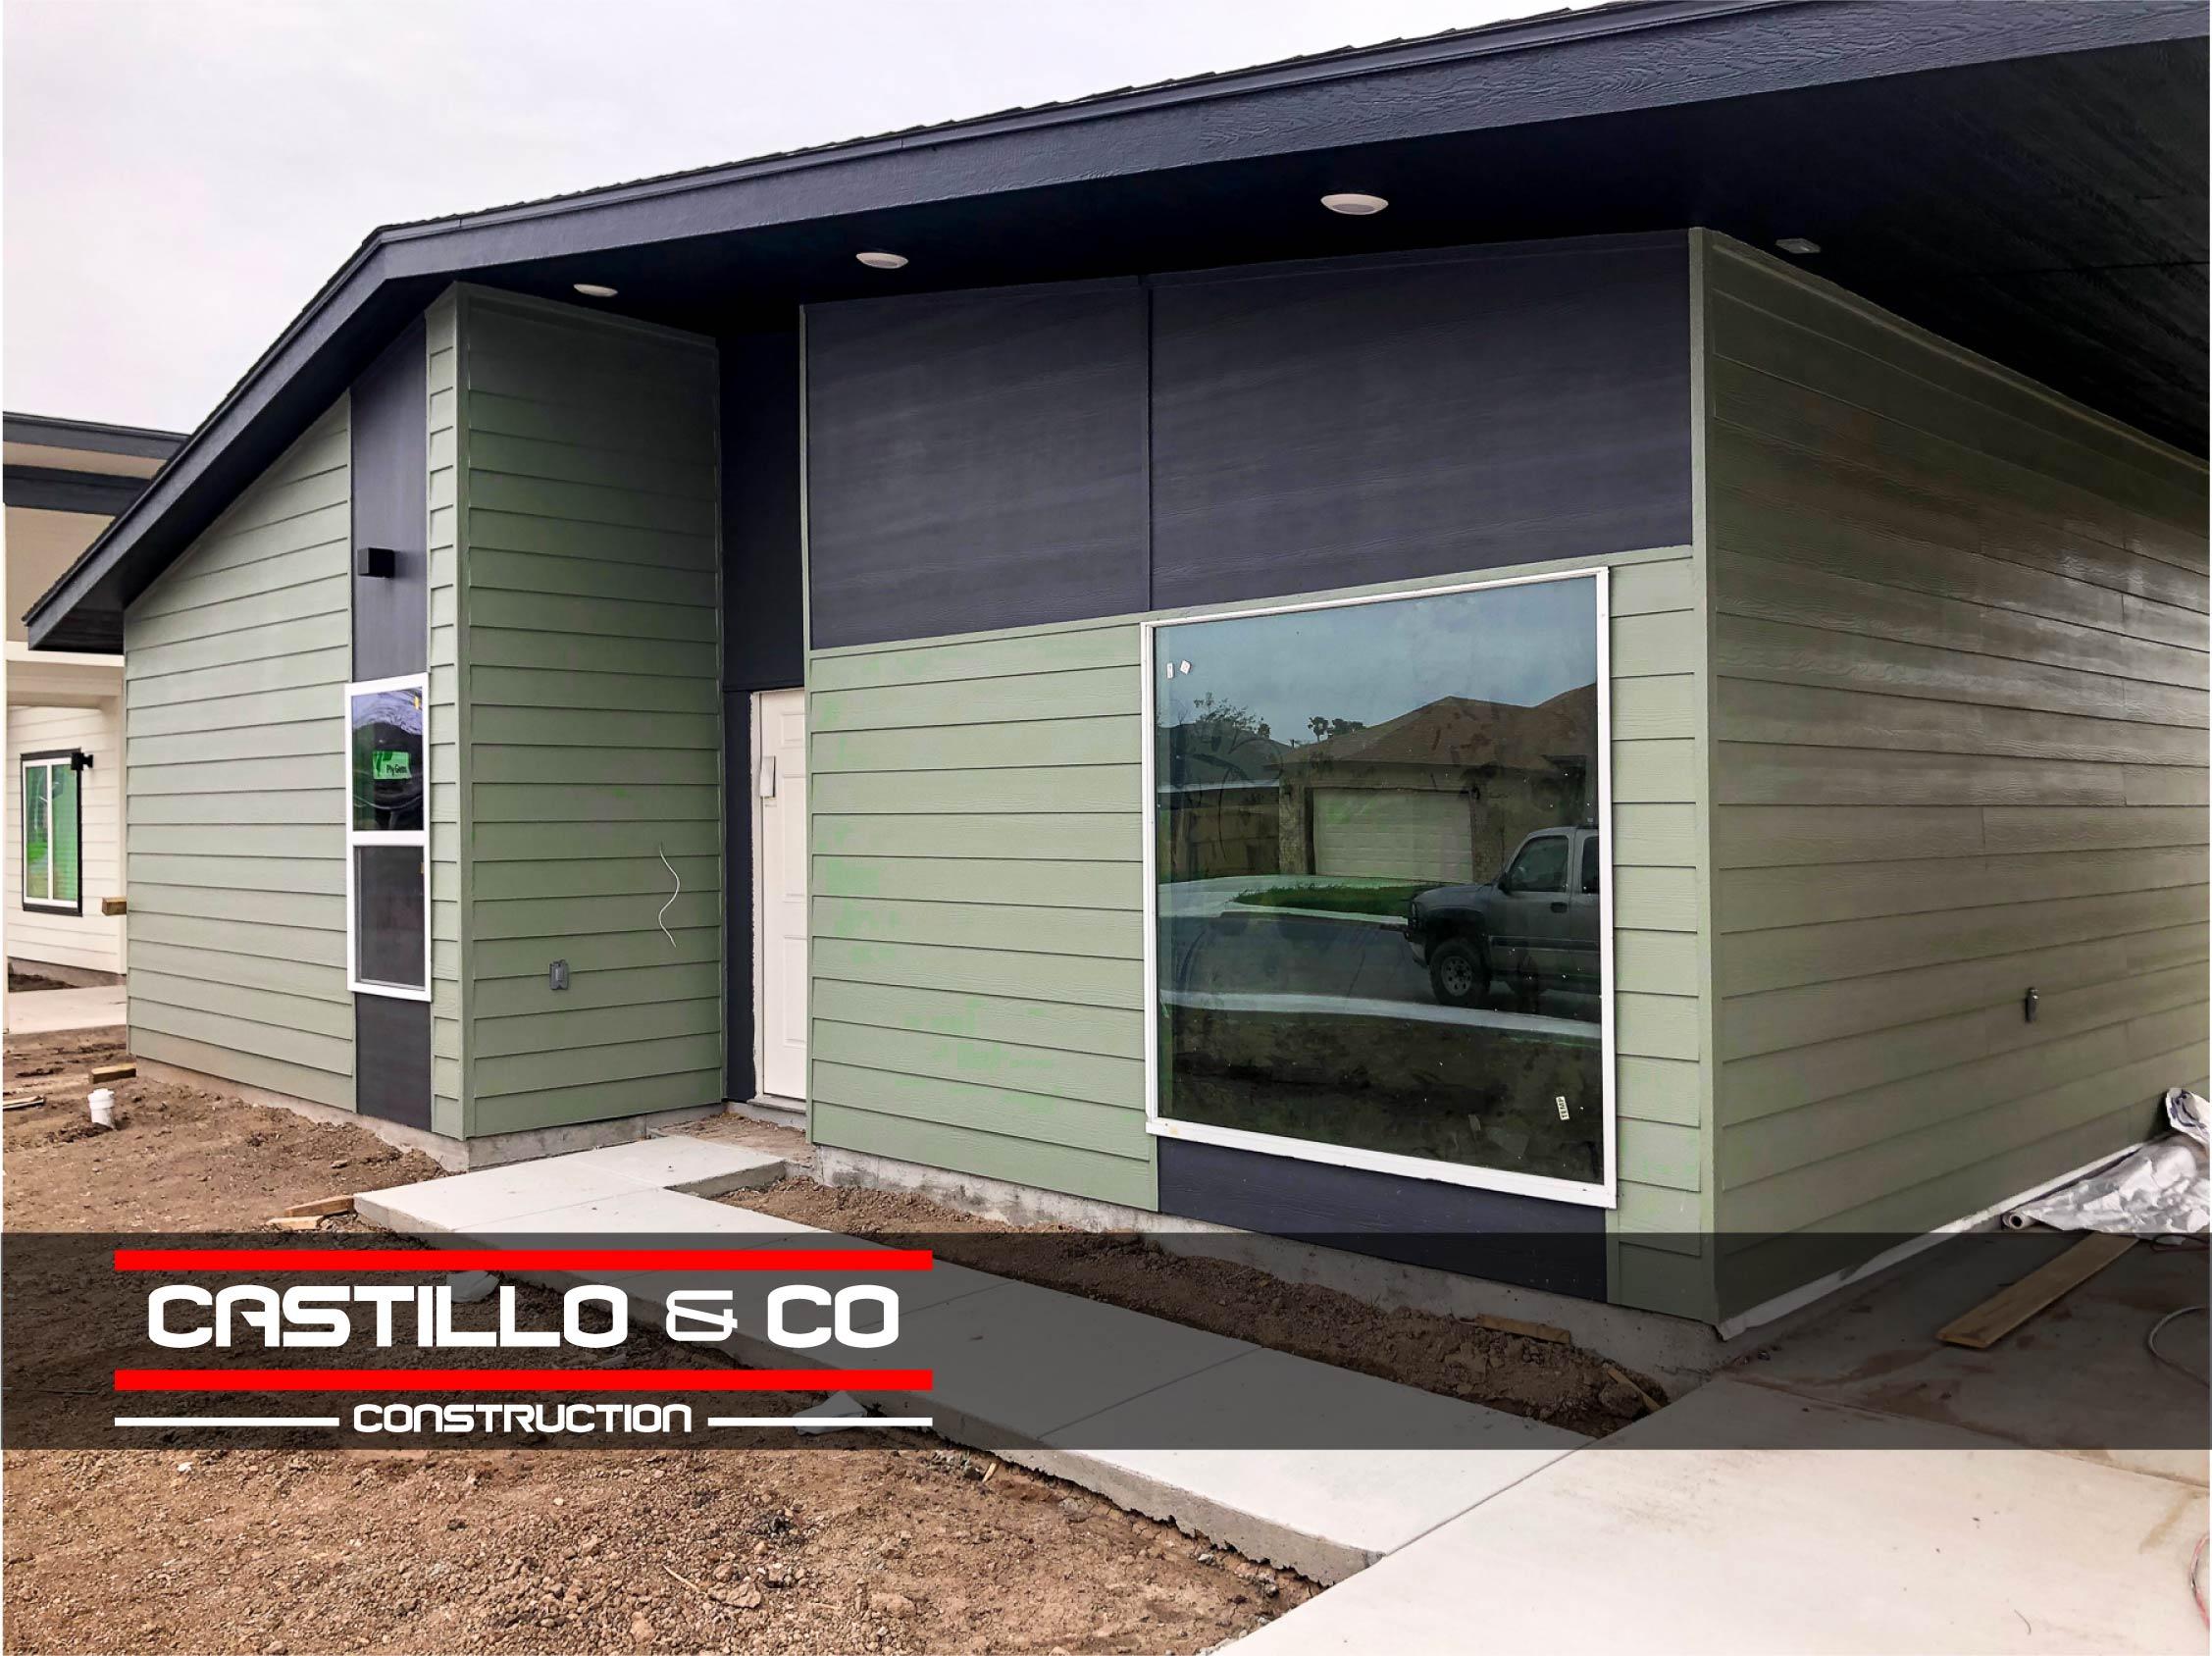 Castillo and Co_Residential Construction_ Harlingen_RGV